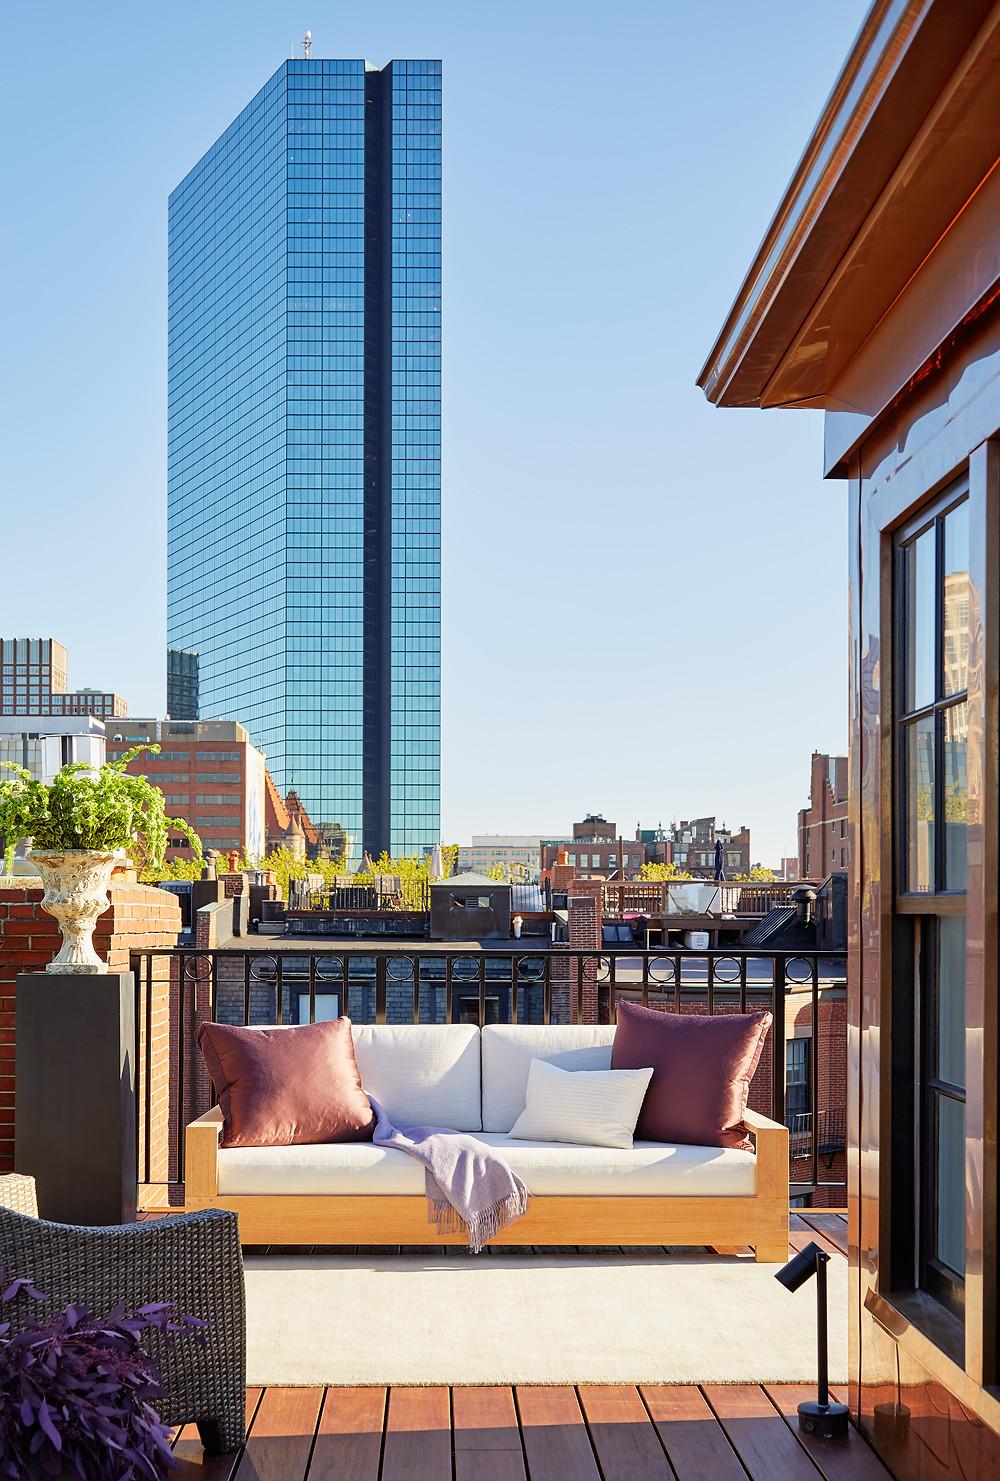 Boston, Lisa Tharp Design, Back Bay, John Hancock, Head House, Roof Deck, Outdoor Furniture